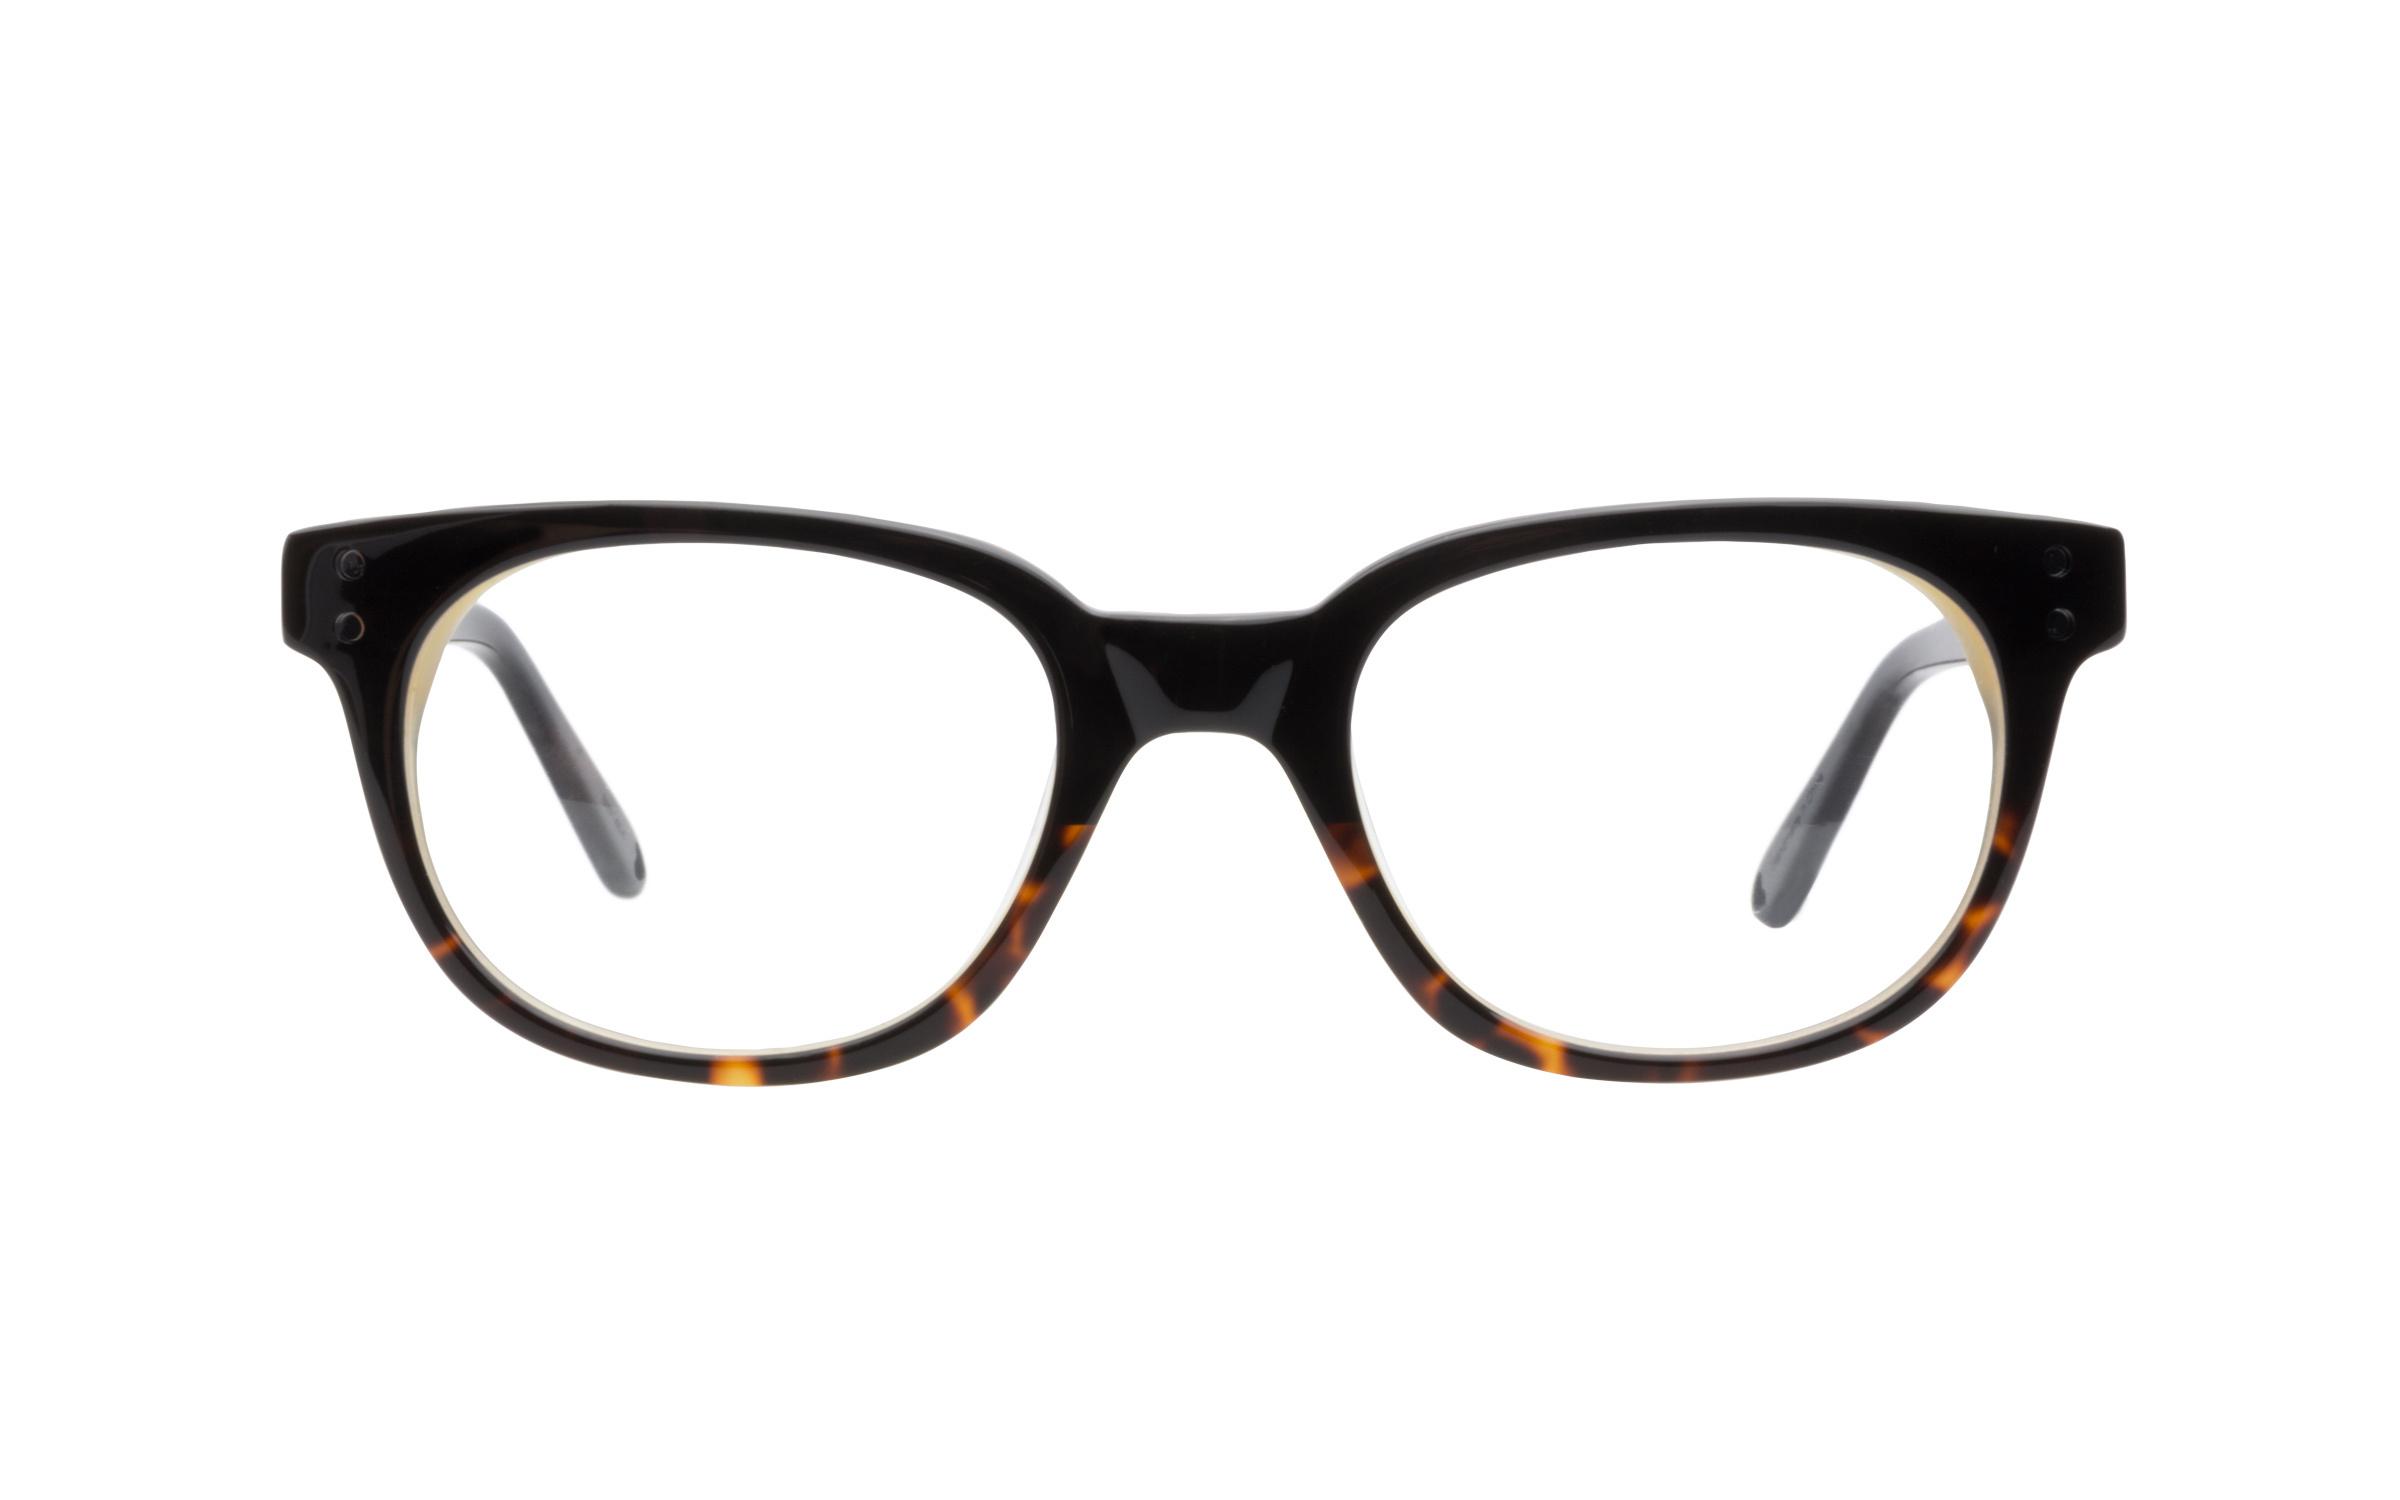 Womens_Vintage_Glasses_Black_Love_Online_Coastal